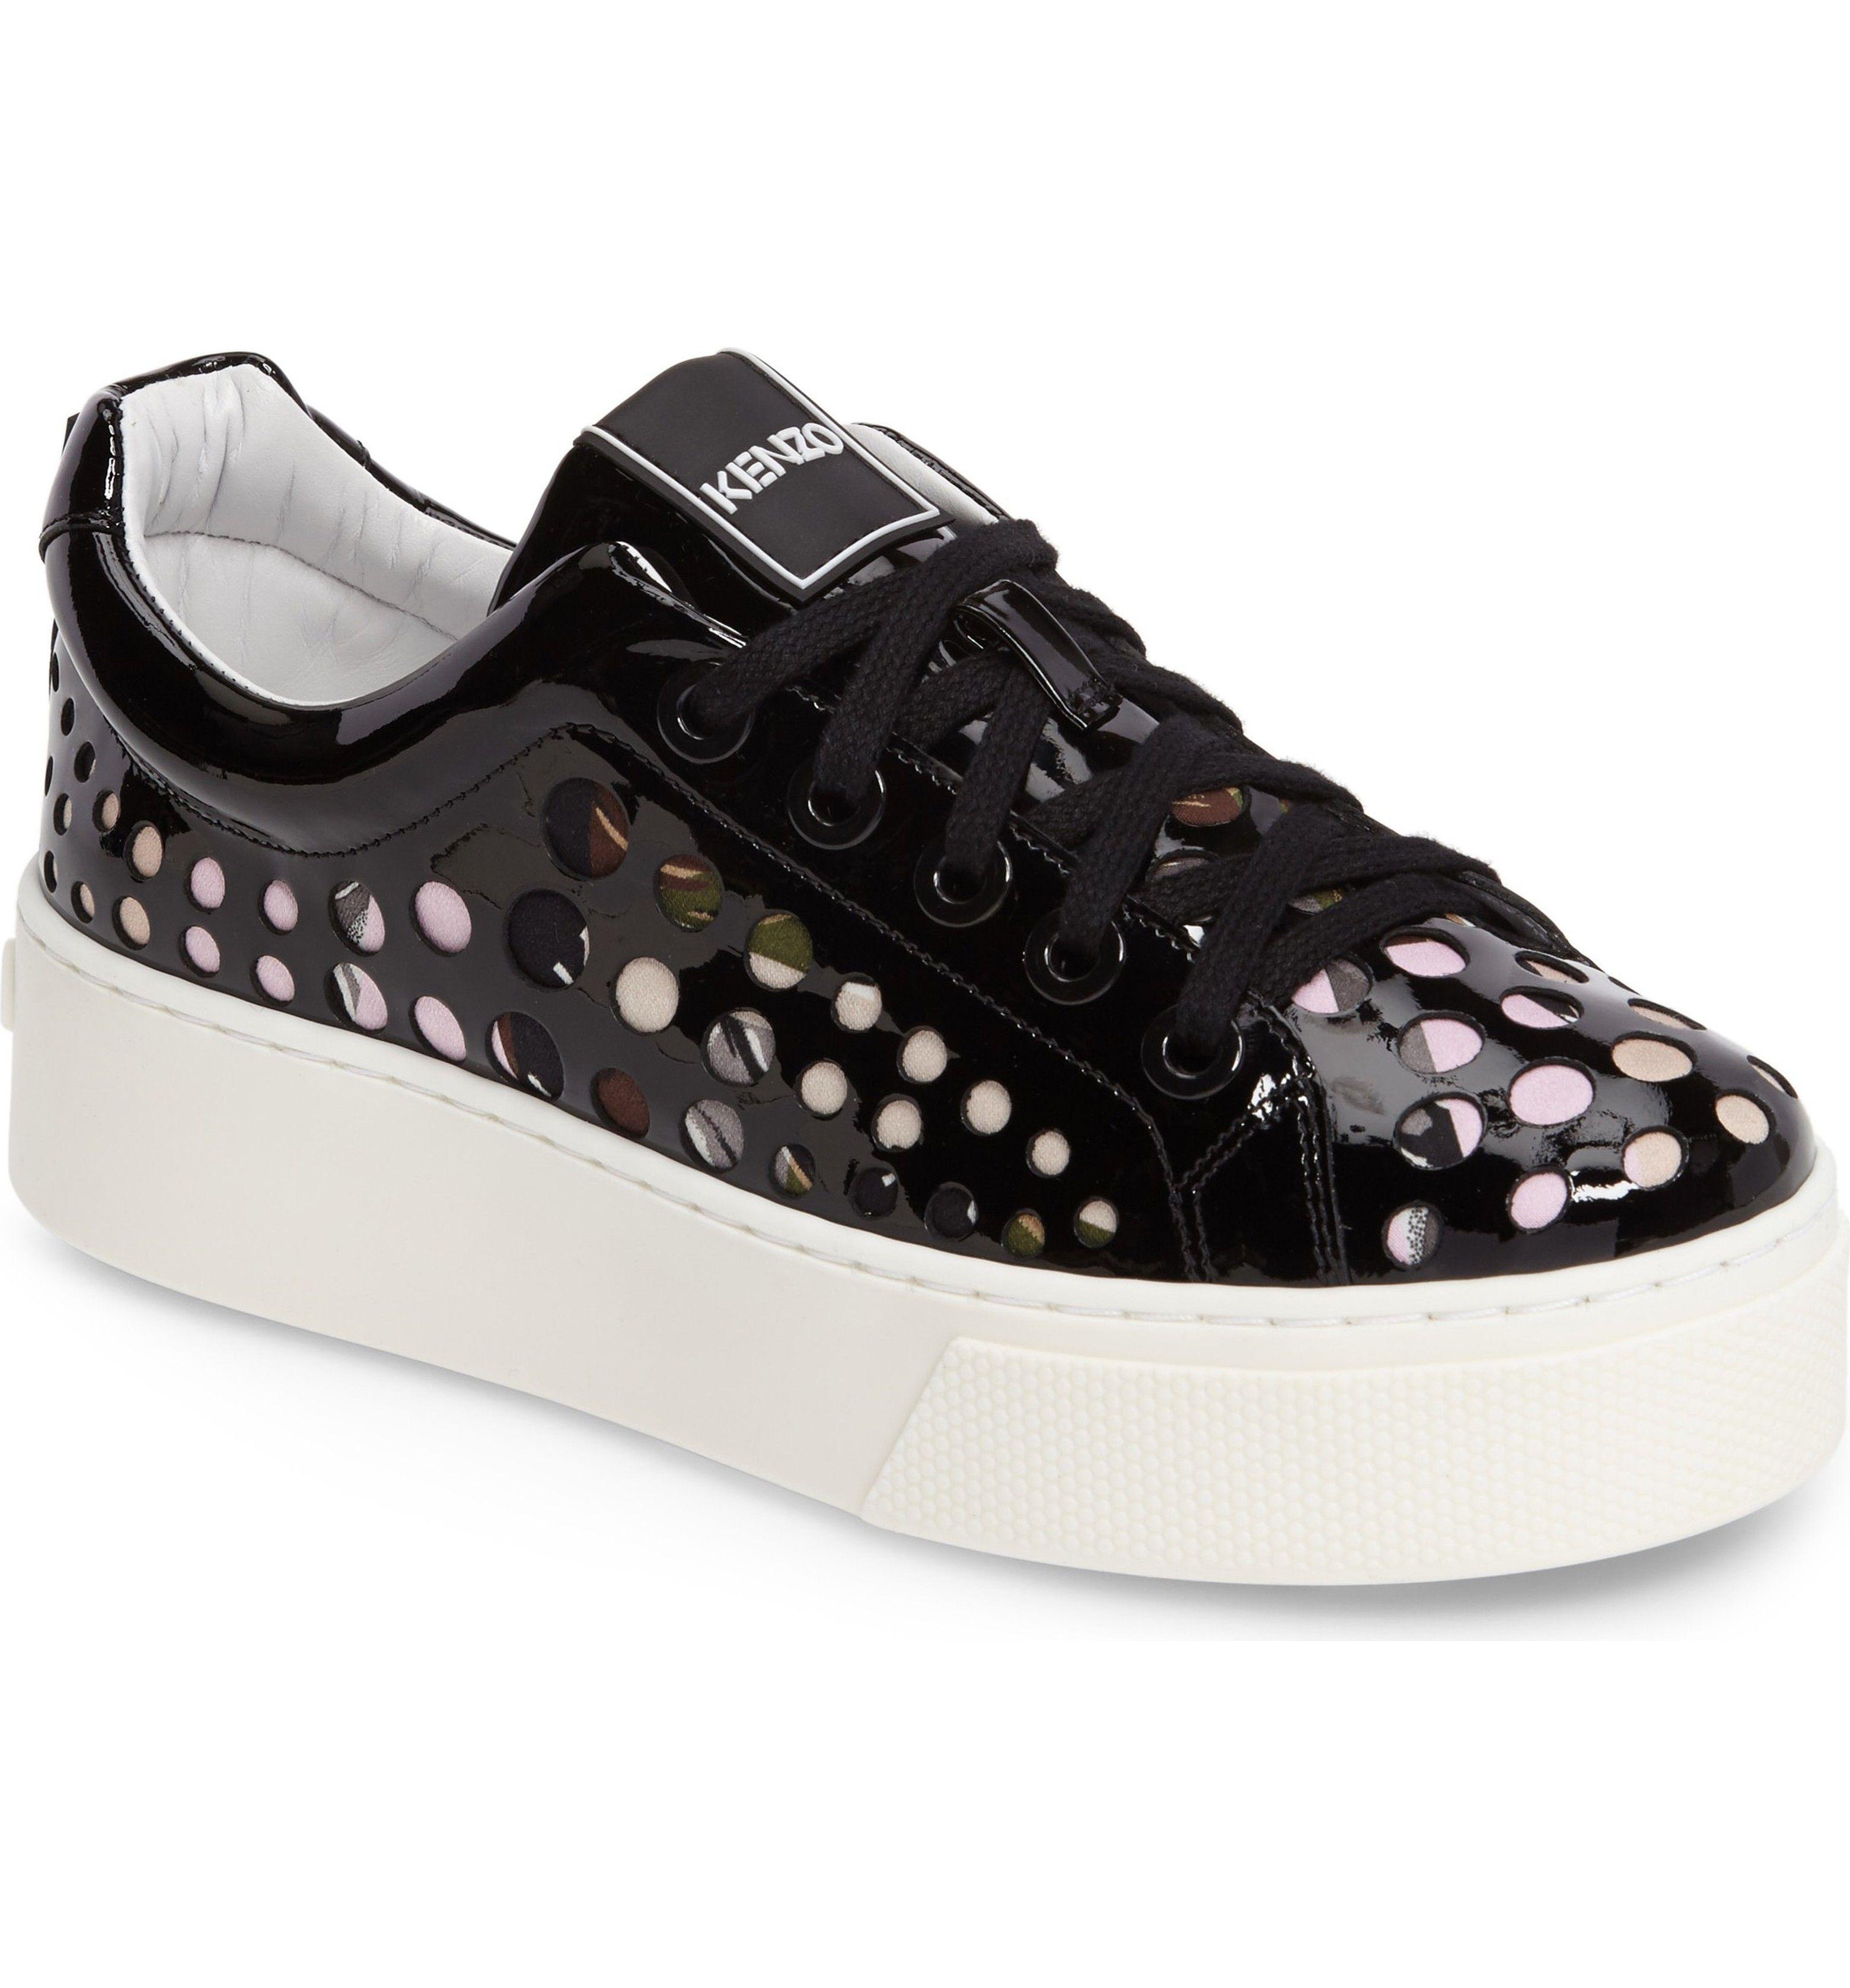 1d22b2c26a99 Main Image - KENZO K-Lace Platform Sneaker (Women) Black Sneakers